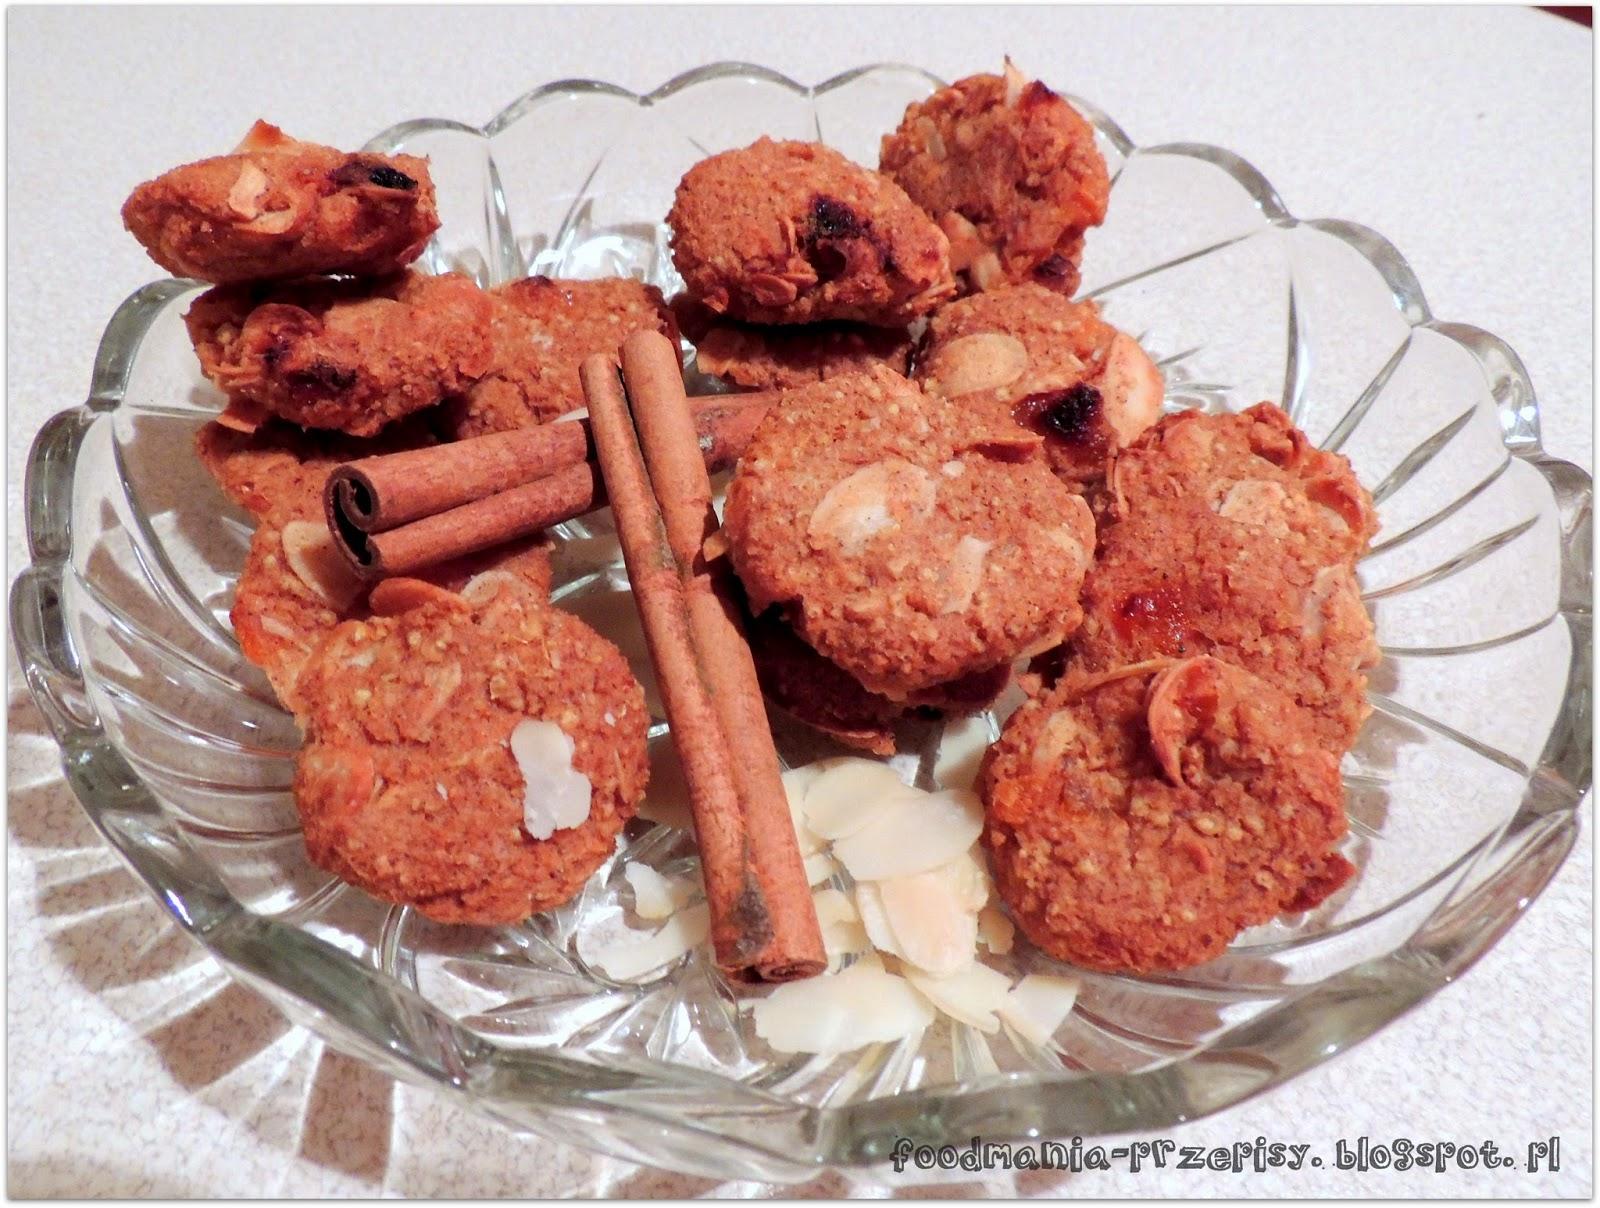 http://foodmania-przepisy.blogspot.com/2014/02/ciasteczka-jaglane-z-morelami.html